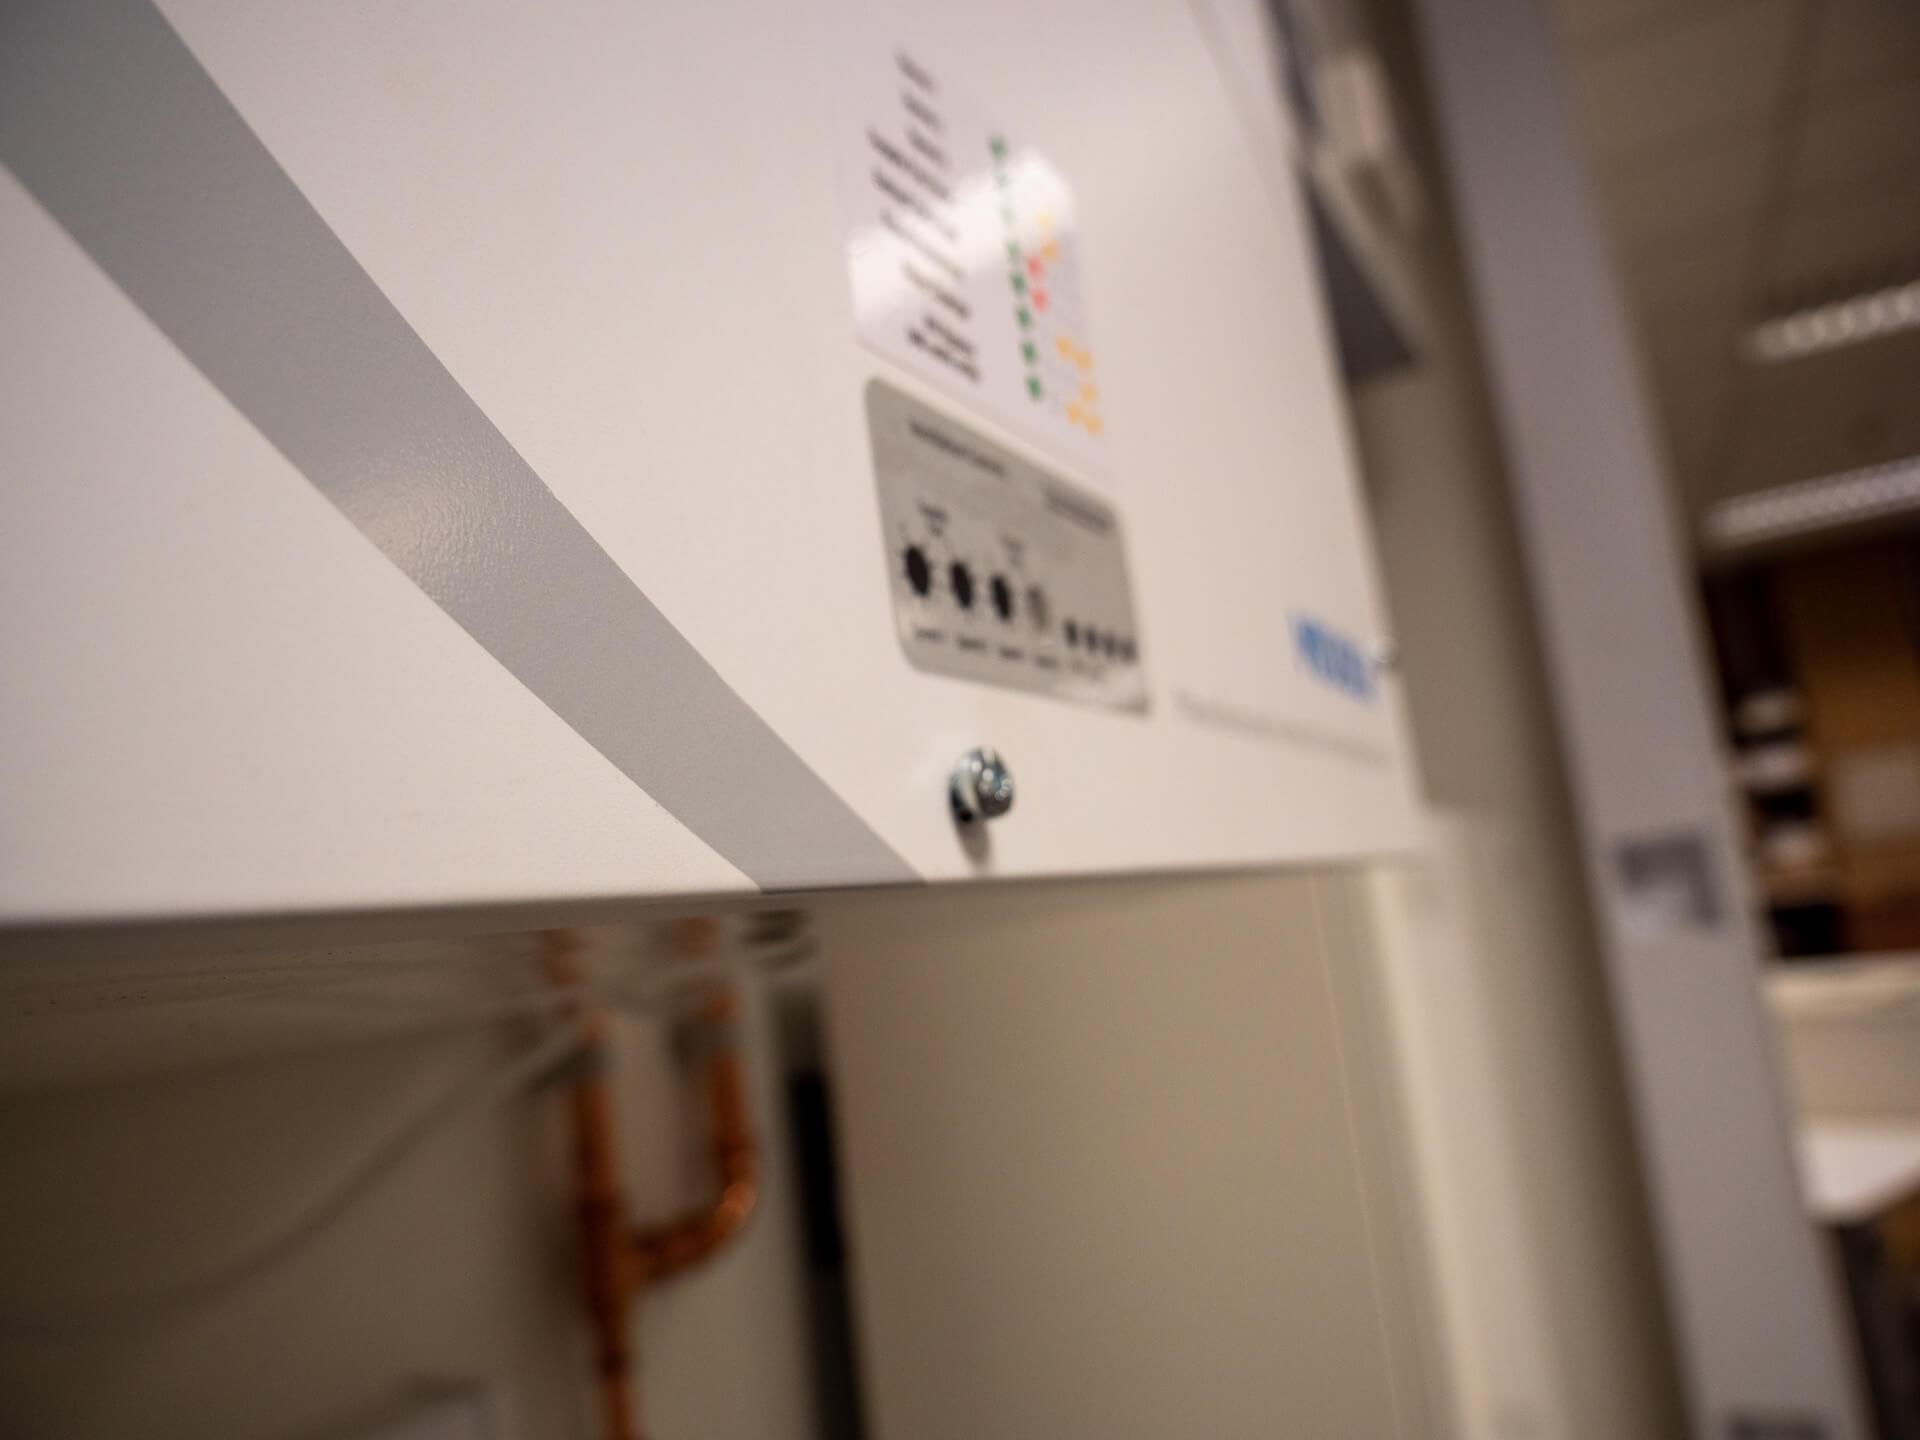 Apex Underfloor Power Track